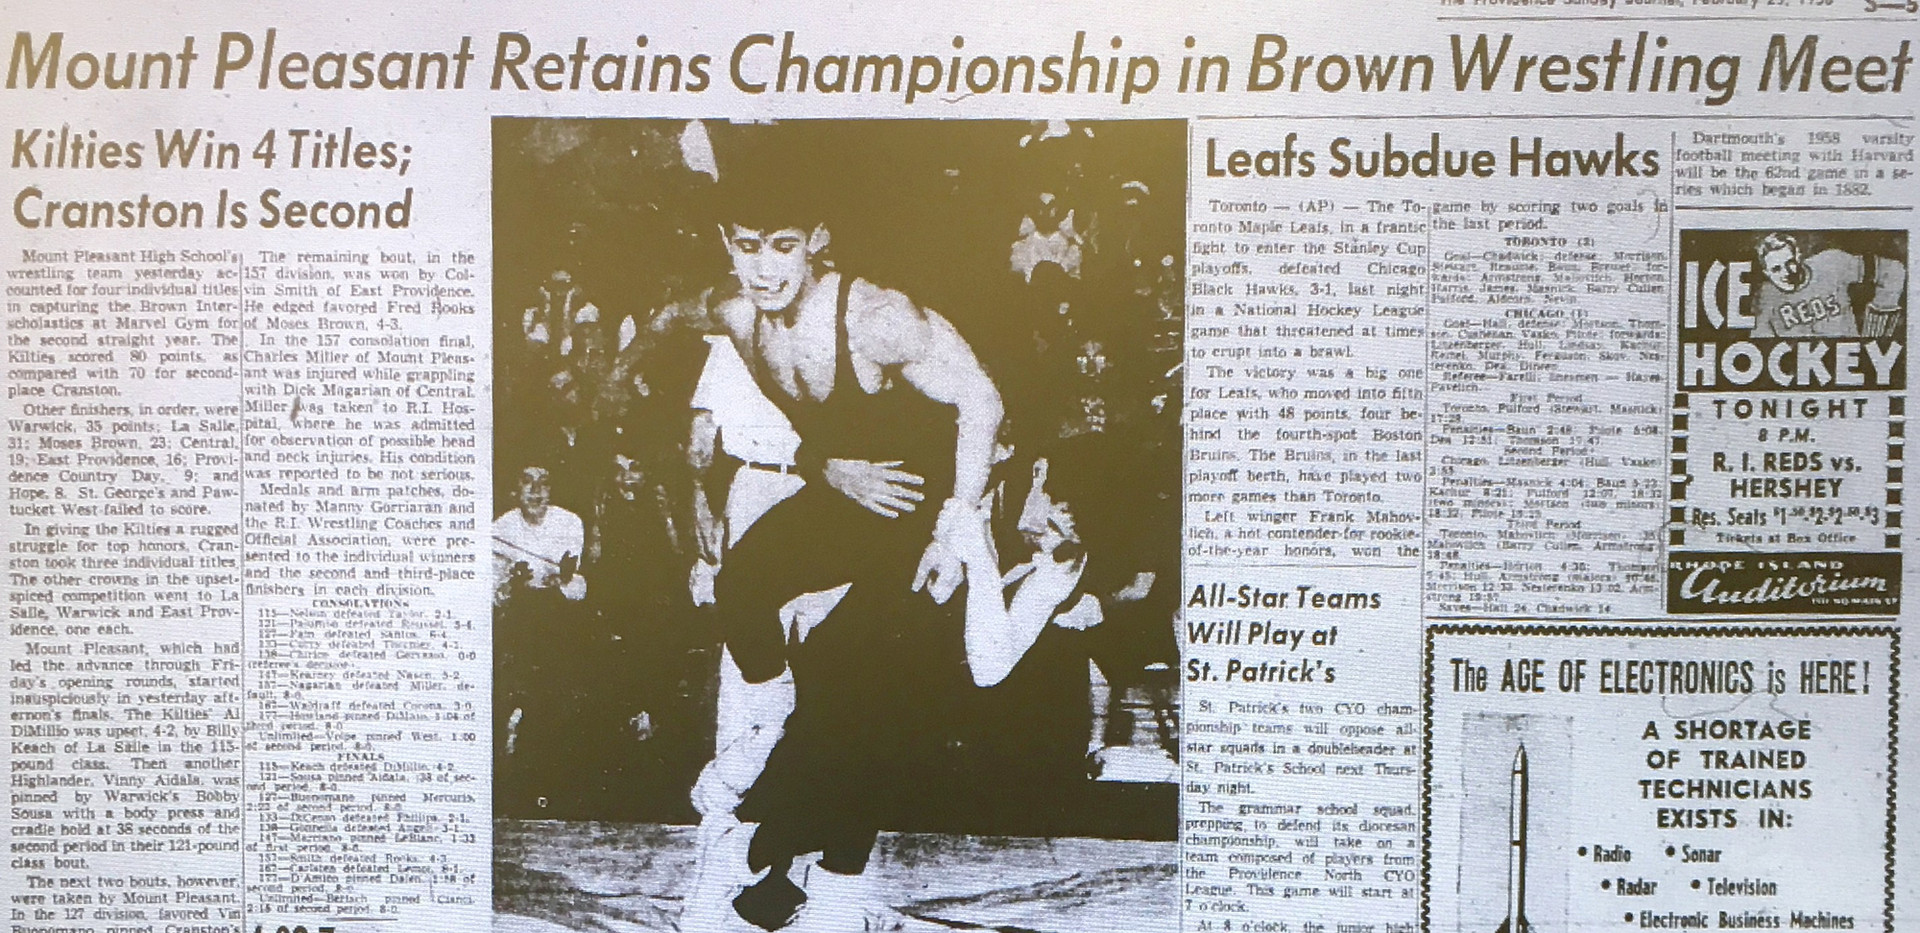 1958 State Tournament